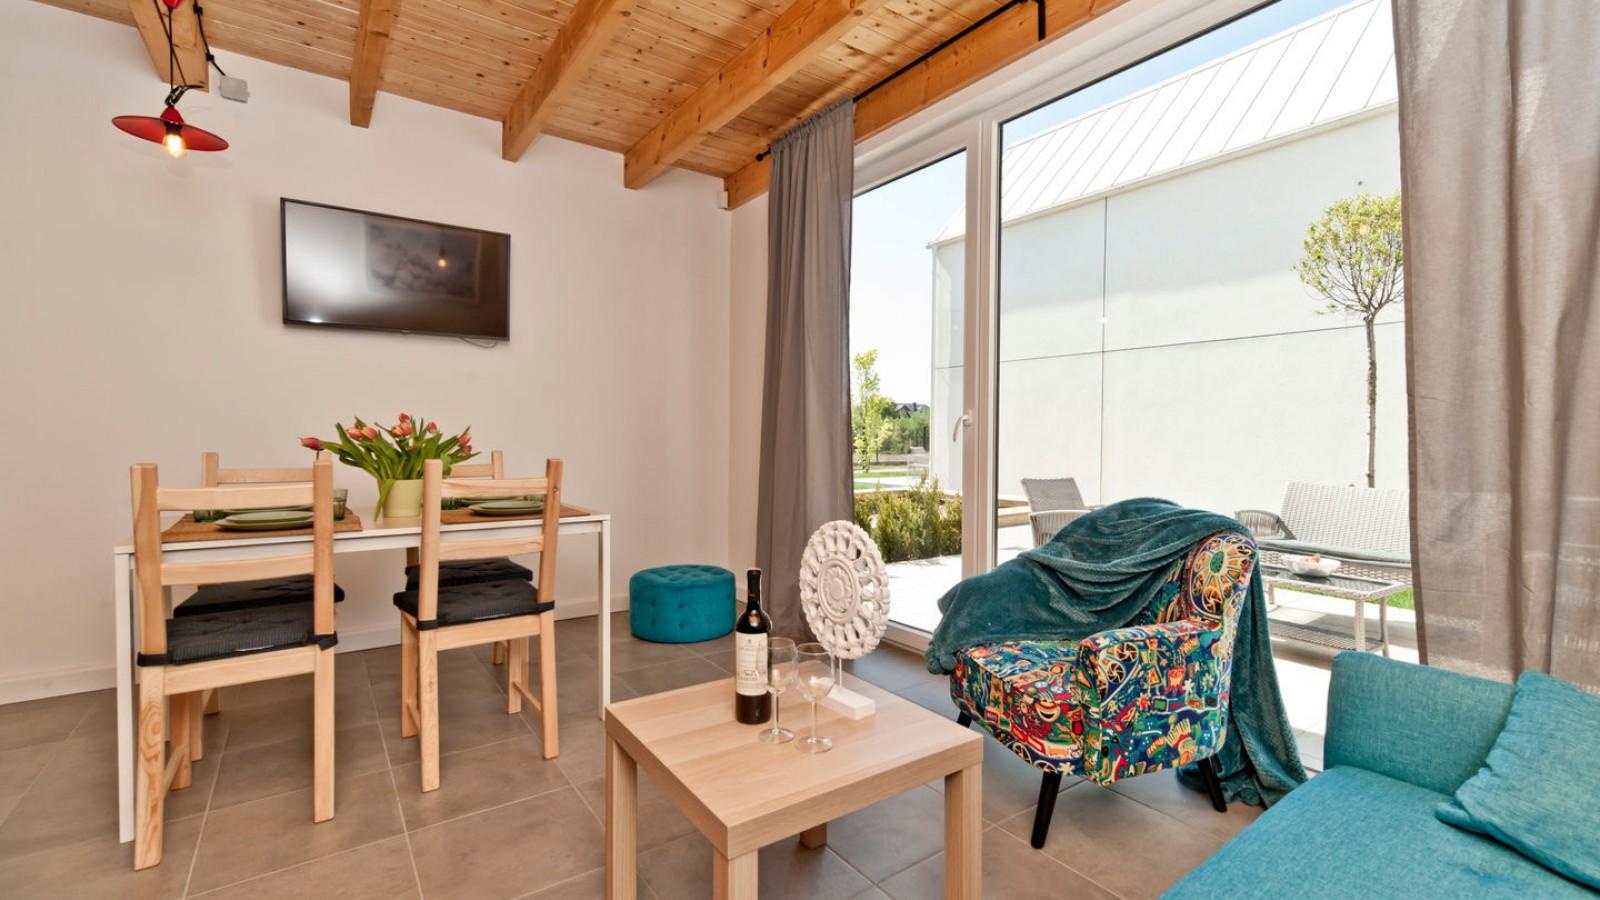 Domek Apartamentowy Scandi 1